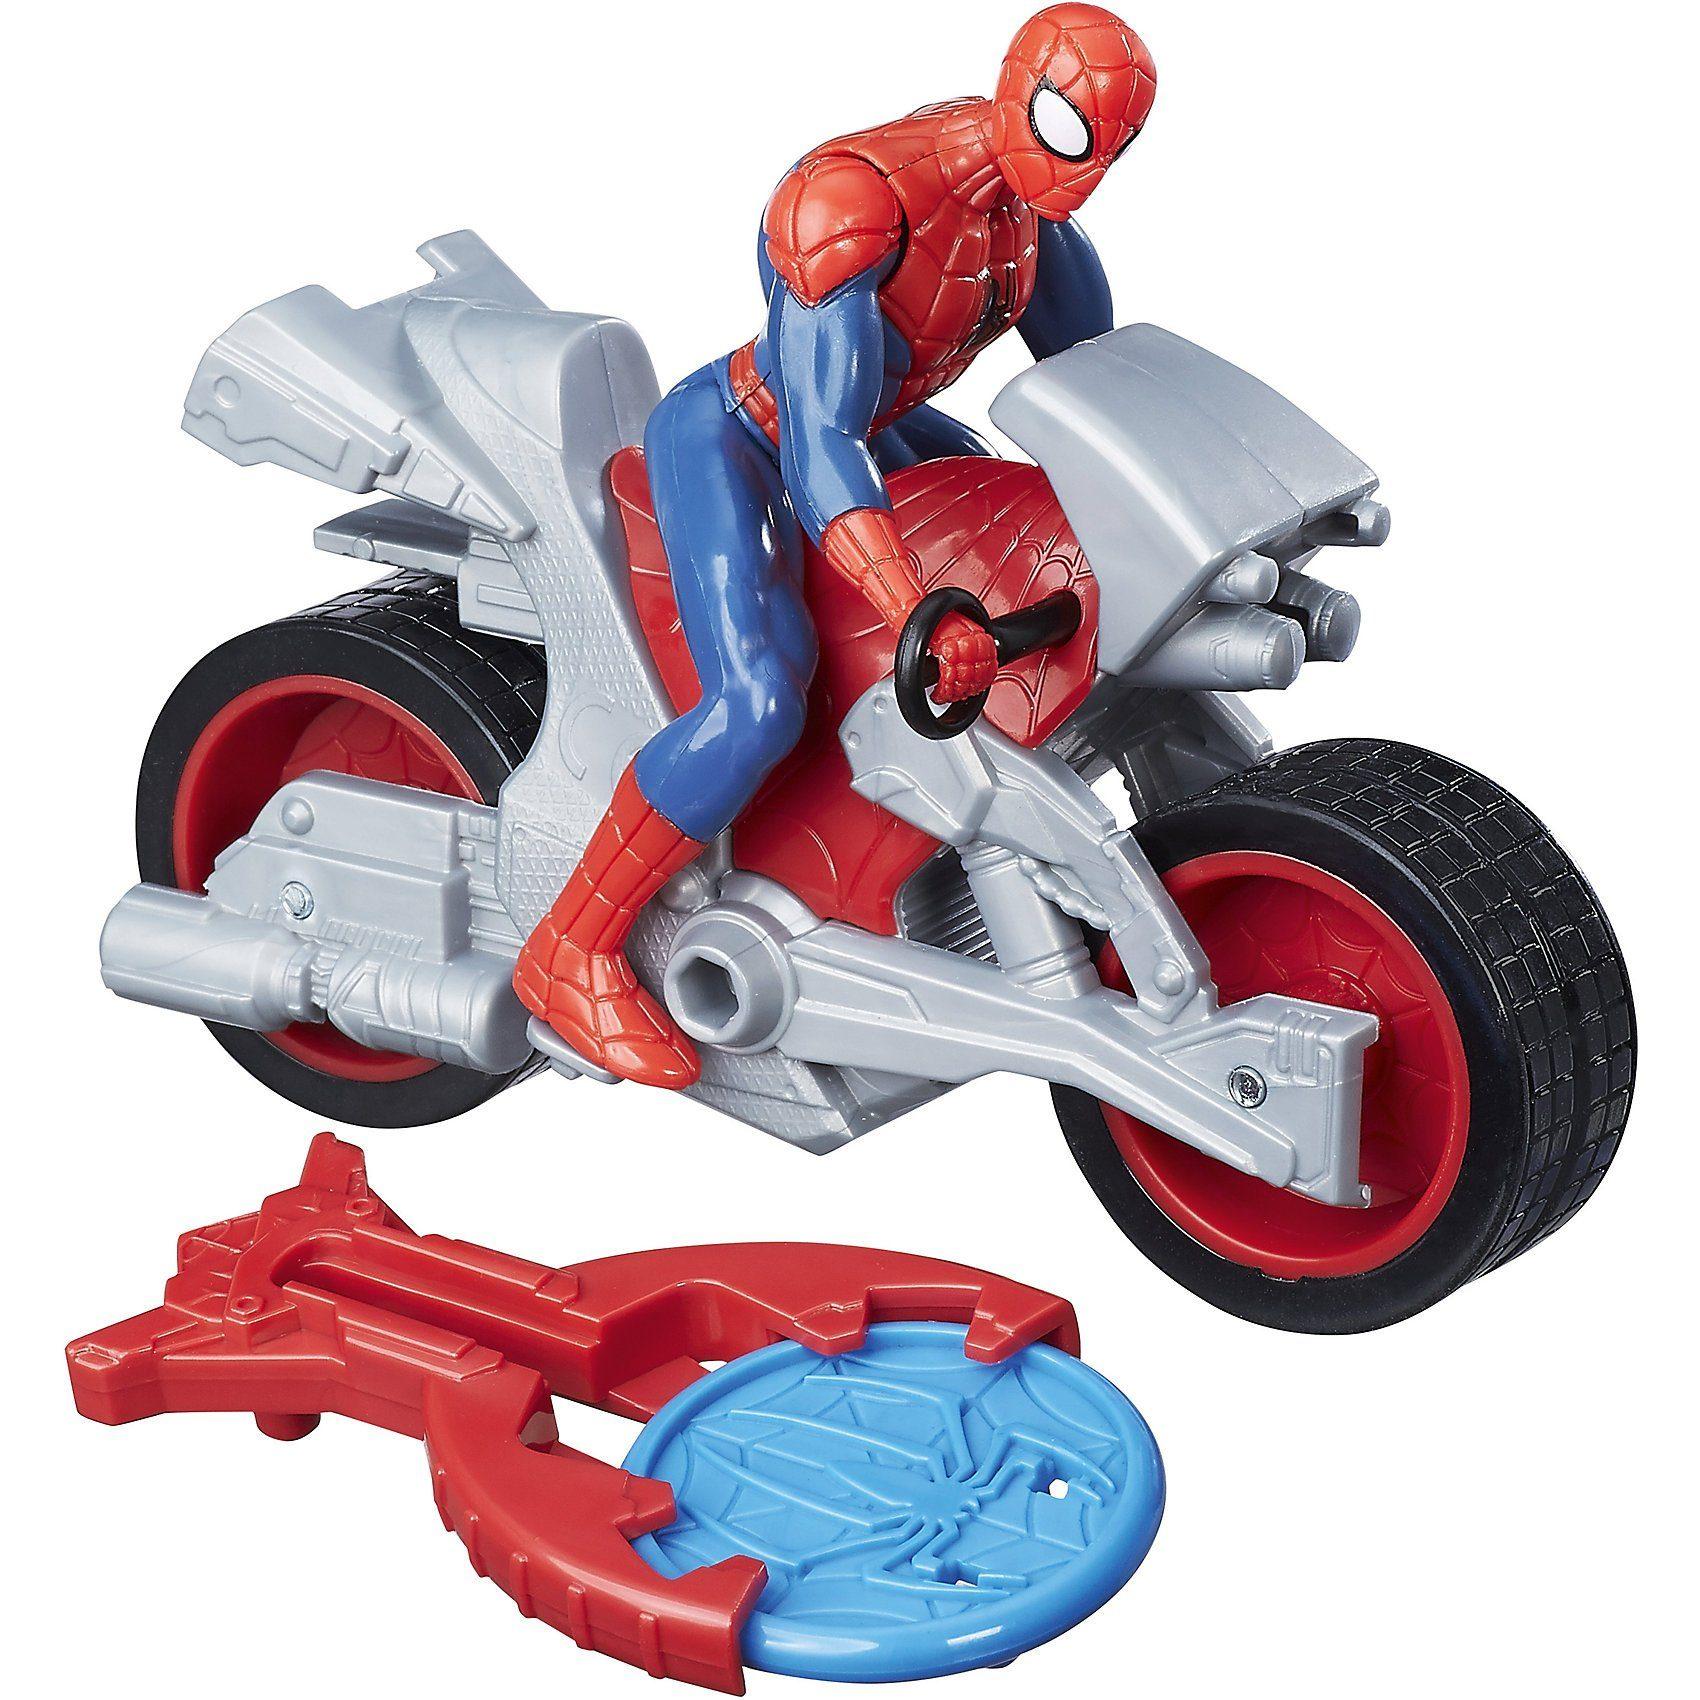 Hasbro Spider-Man Blast N Go